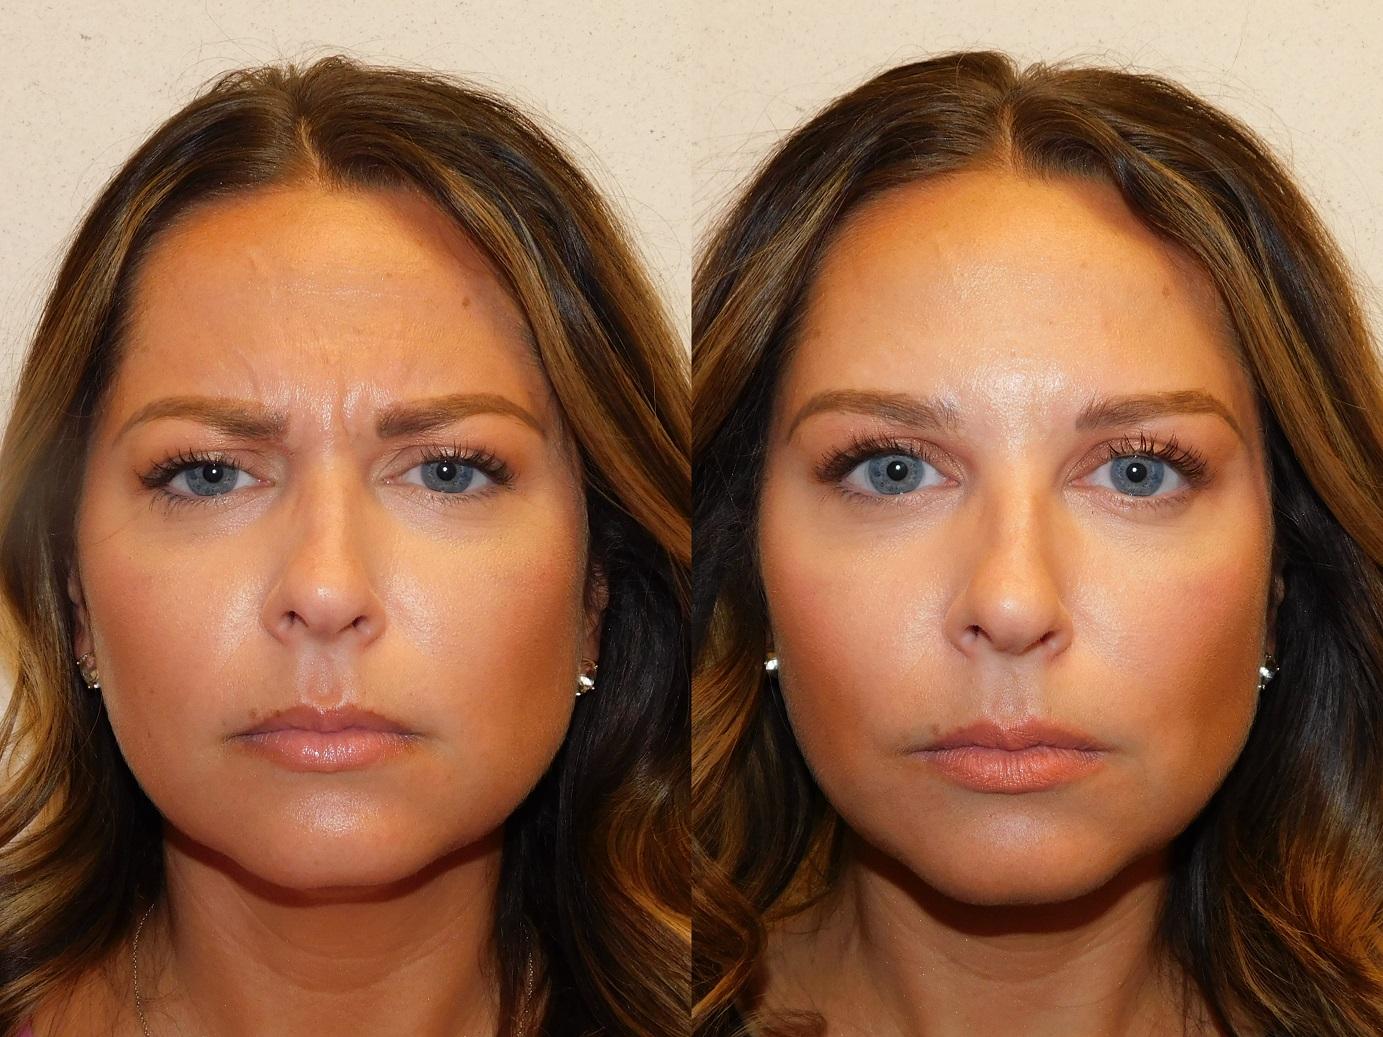 Botox results-Jeuveau-#NEWTOX-Dr. Joel Schlessinger-LovelySkin Omaha-Omaha Blogger-Omaha Beauty Blogger-Beauty Blog Post-Botox Results-Sabby Style-8